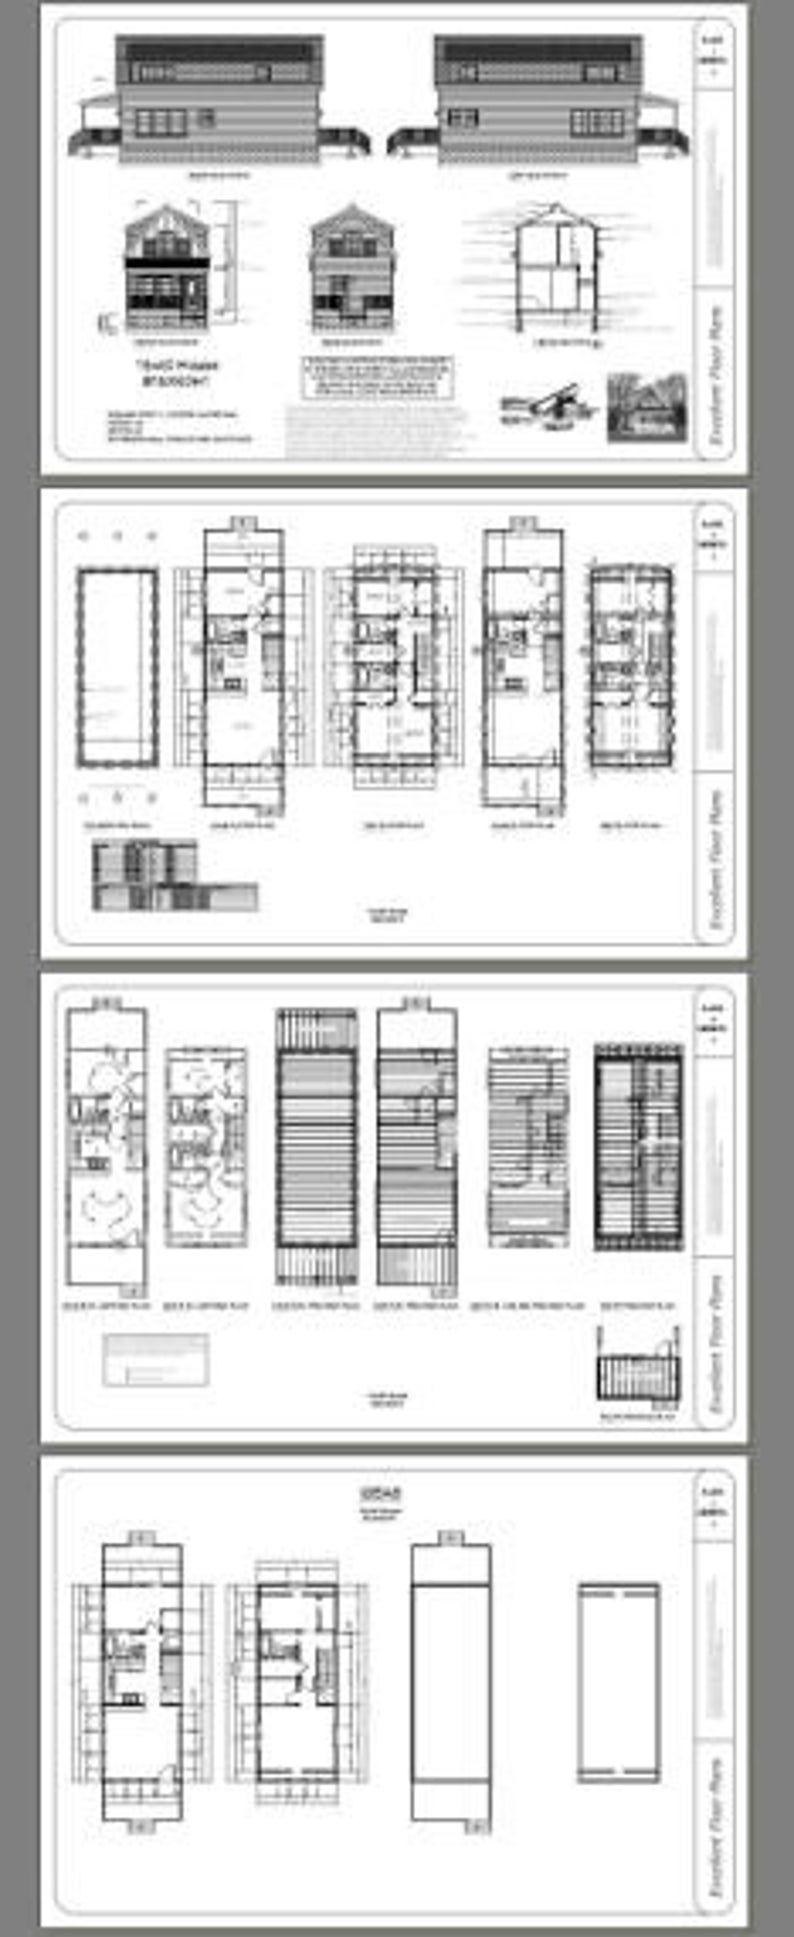 16x40 House 1,193 sq ft PDF Floor Plan Instant